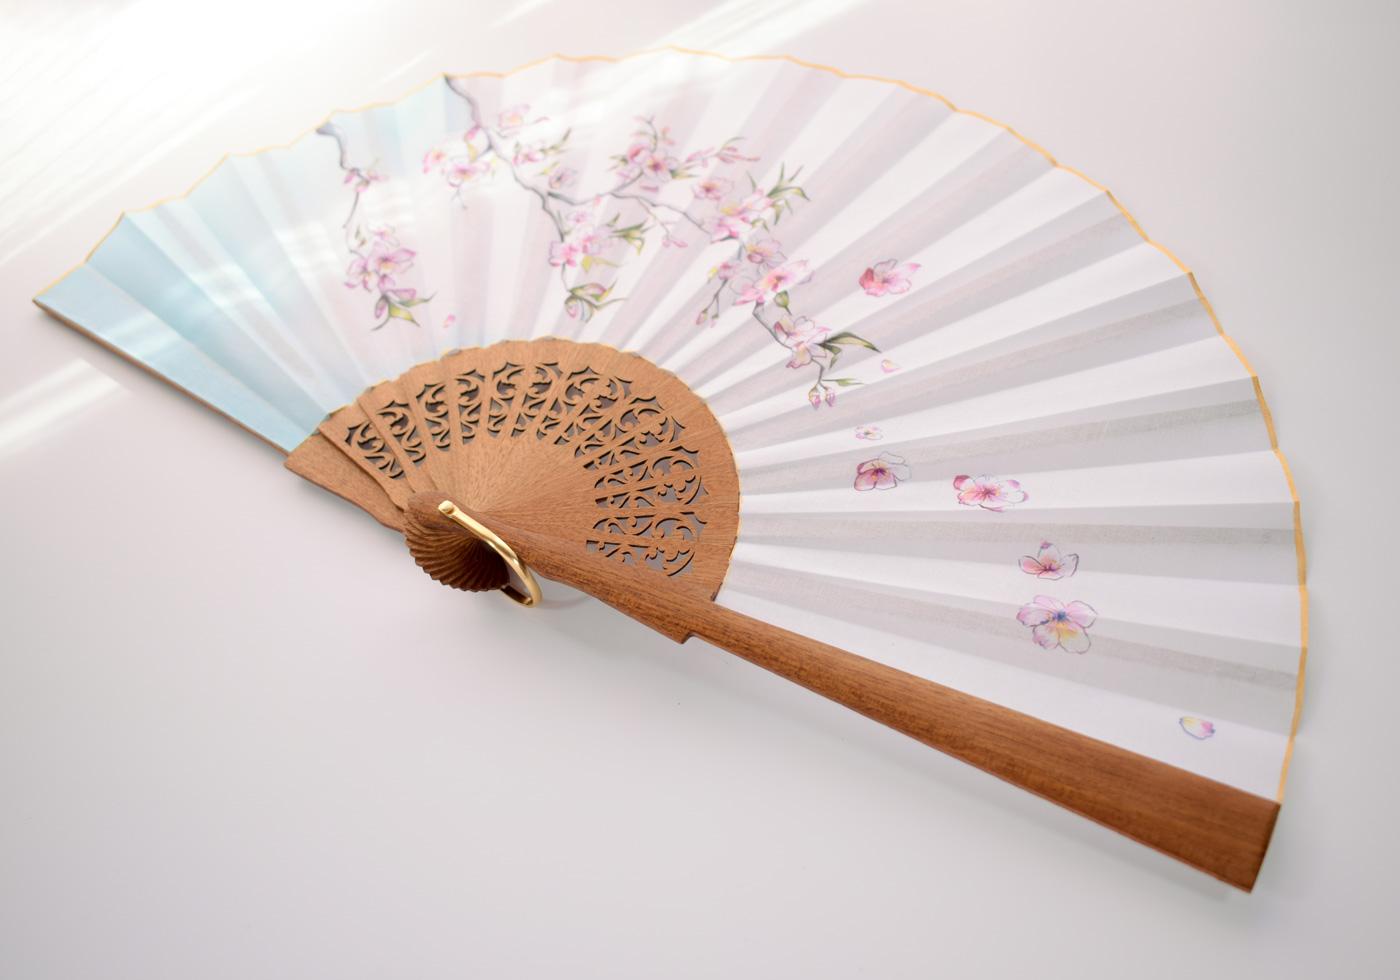 painted hand fan custom fan personalized hand fans wooden hand fan embroidered hand fan in different models and colors Flowers hand fan